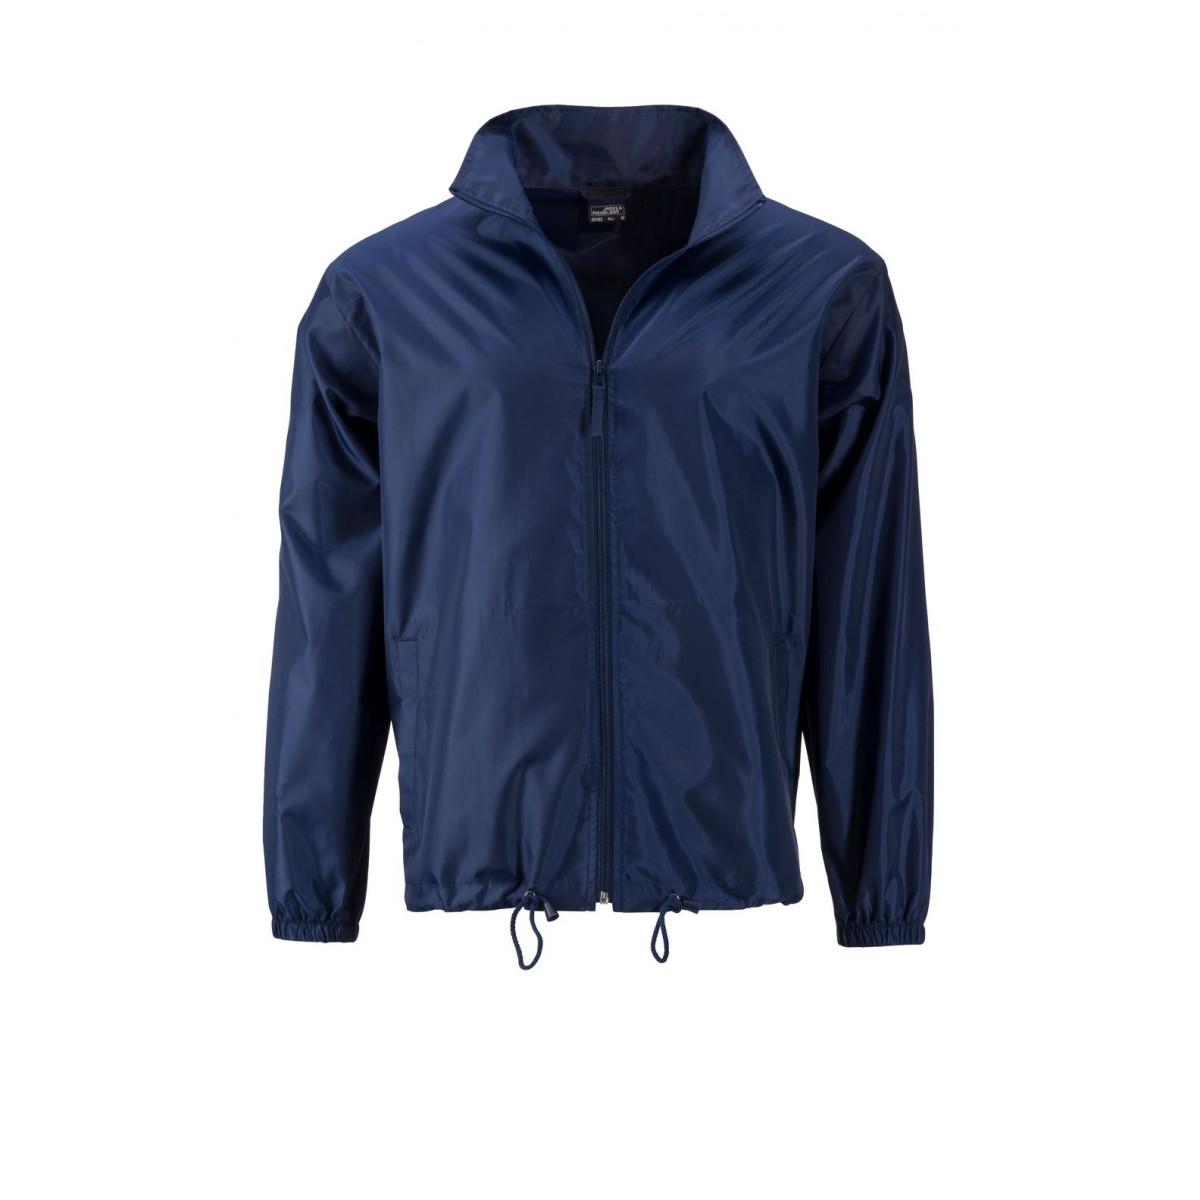 Куртка мужская JN1132 Mens Promo Jacket - Темно-синий